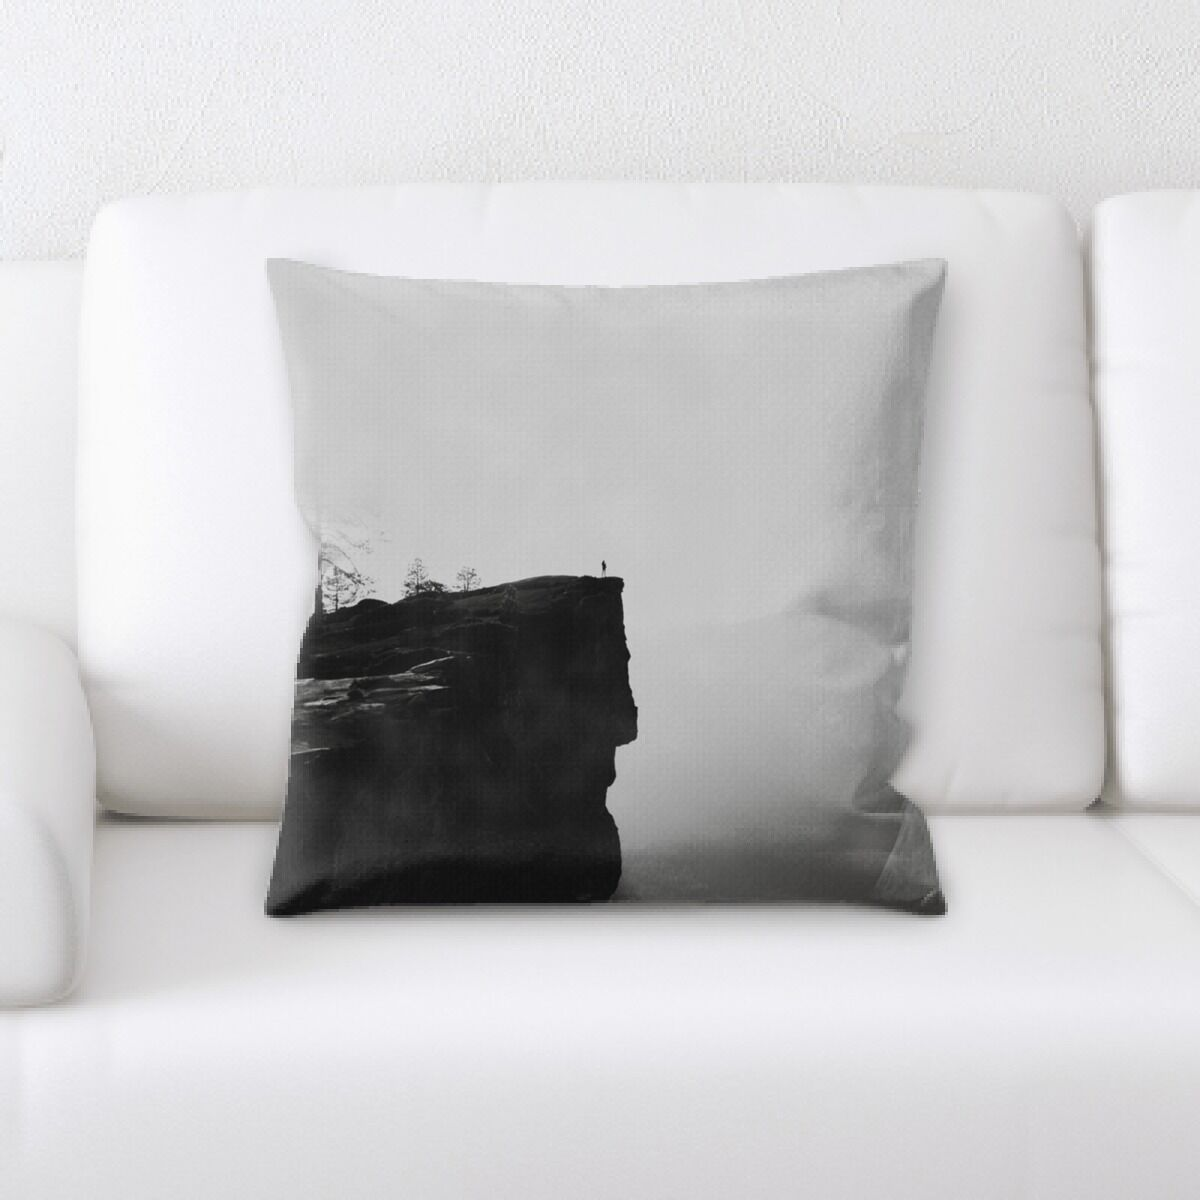 Erkson Mountain and Cliffs (20) Throw Pillow